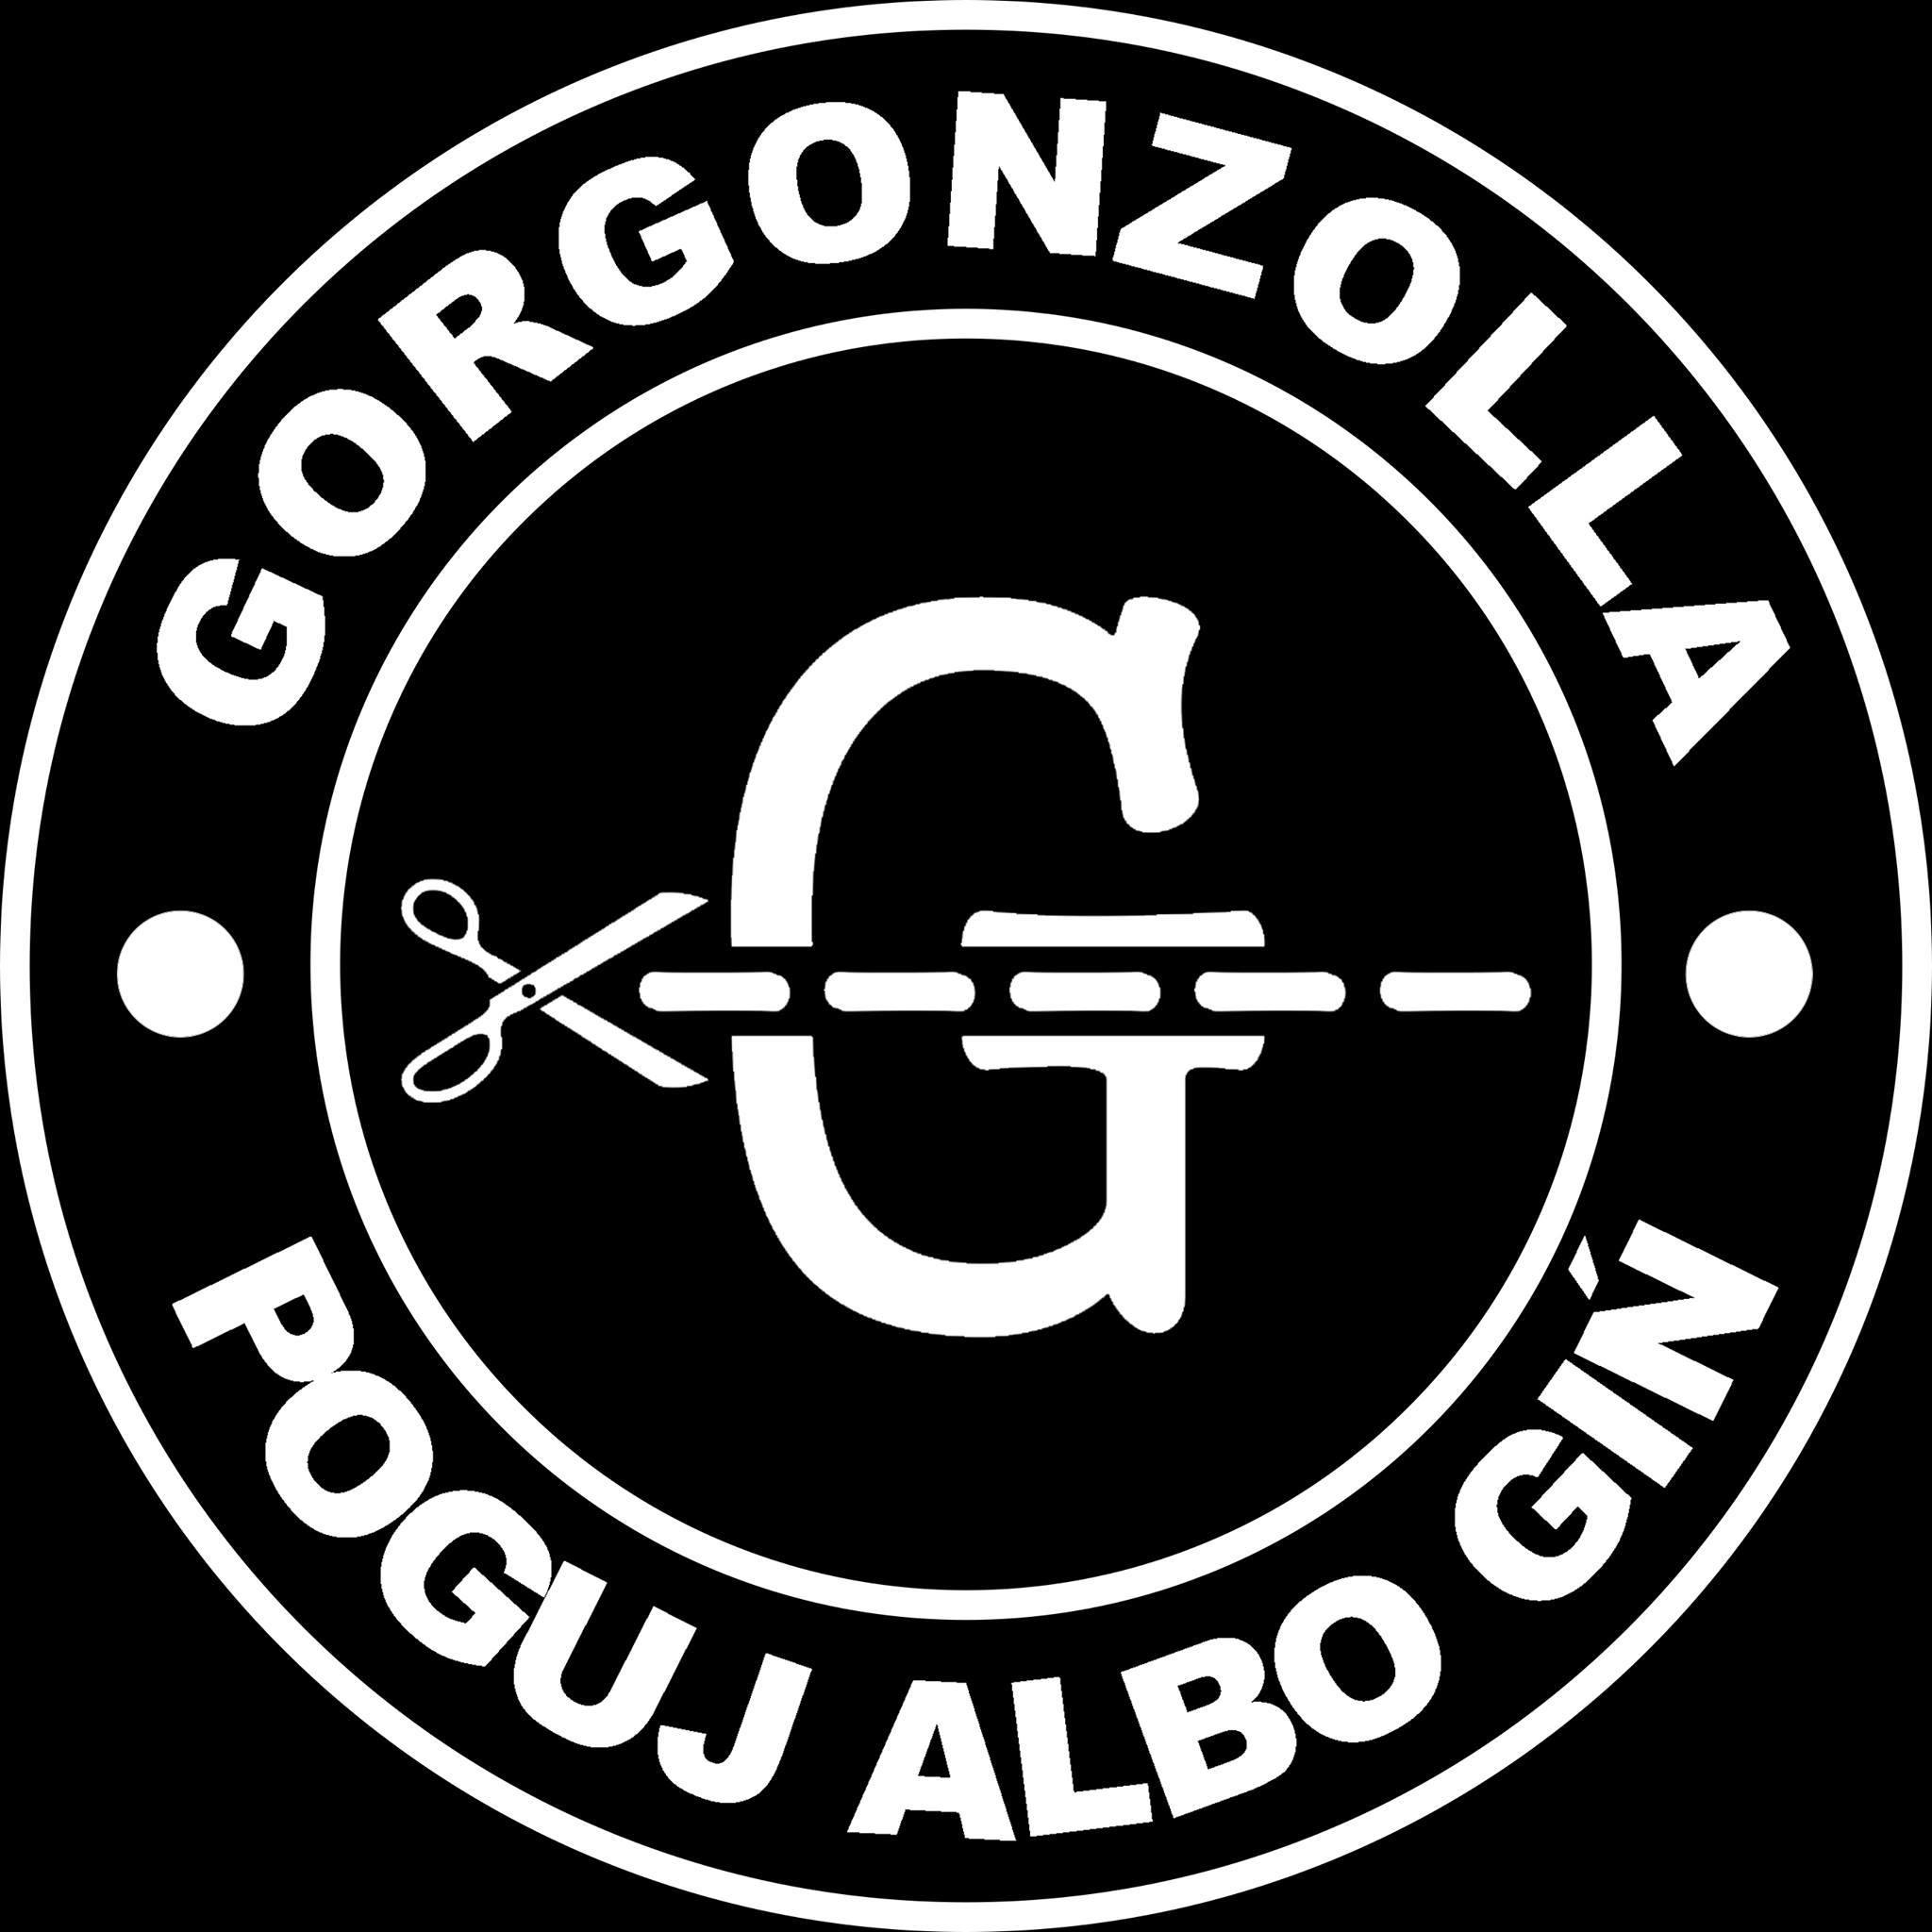 Konsumpcja - Gorgonzolla